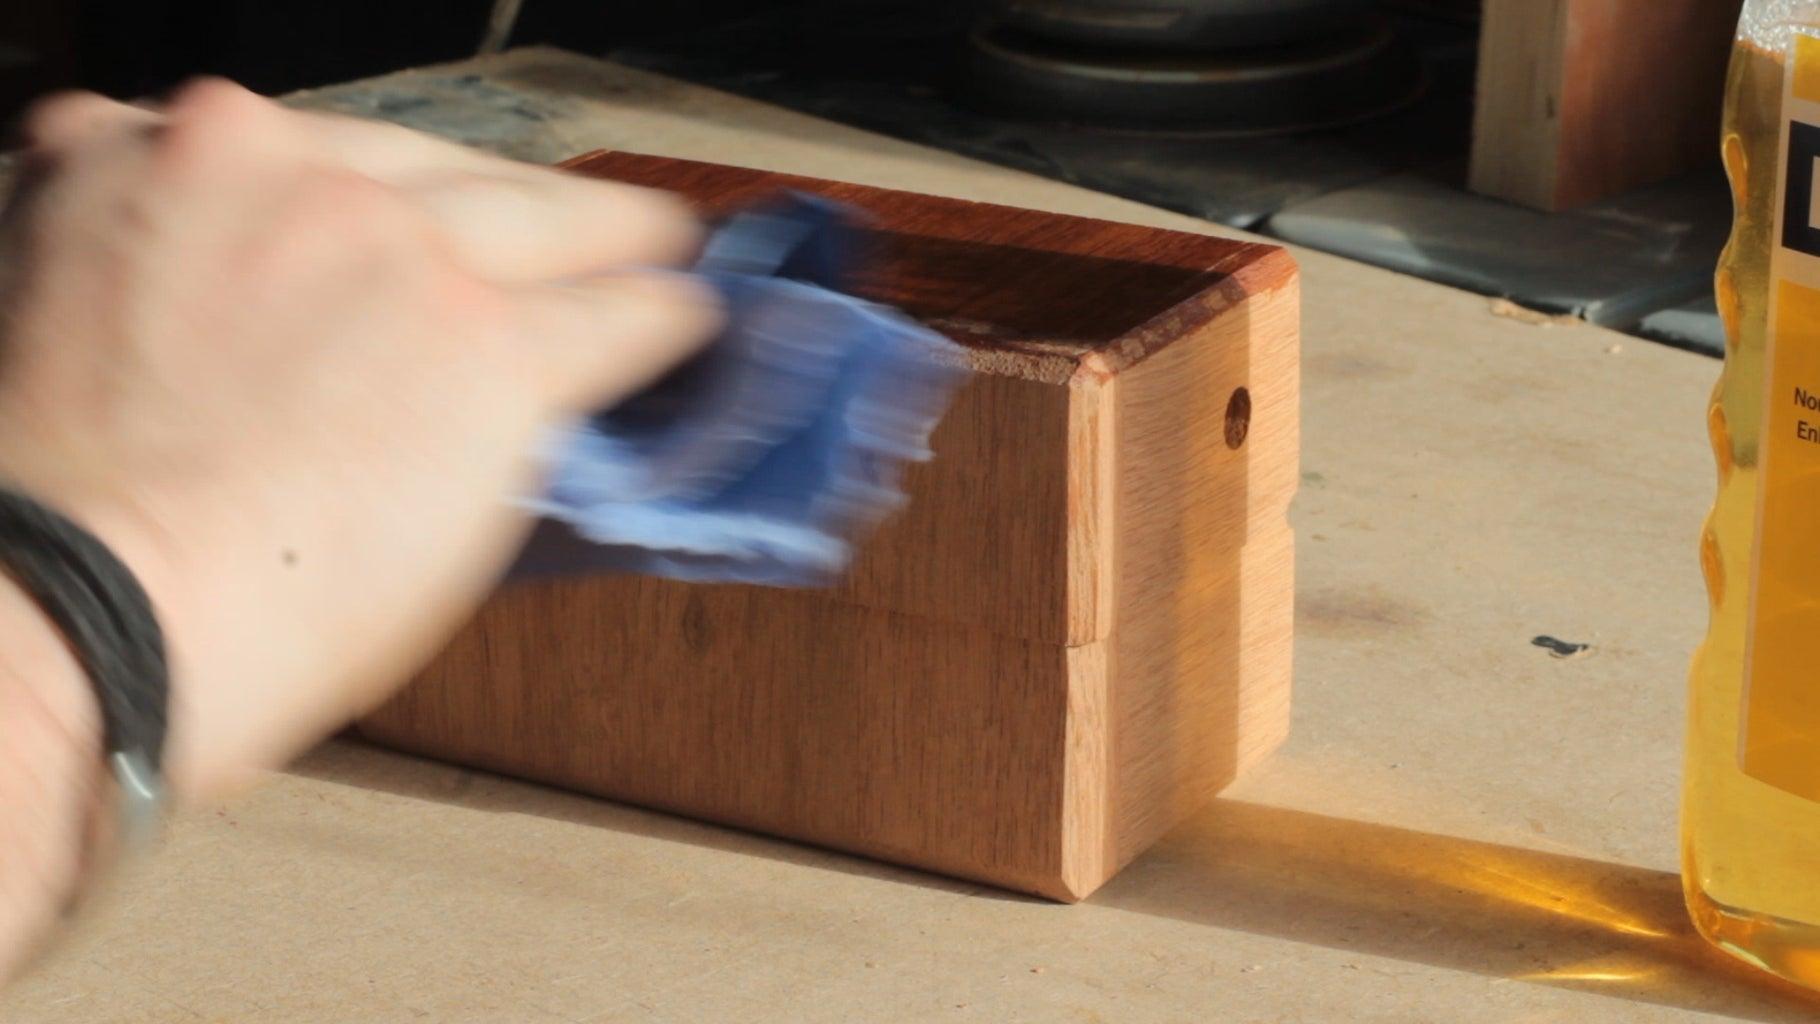 Finishing the Box